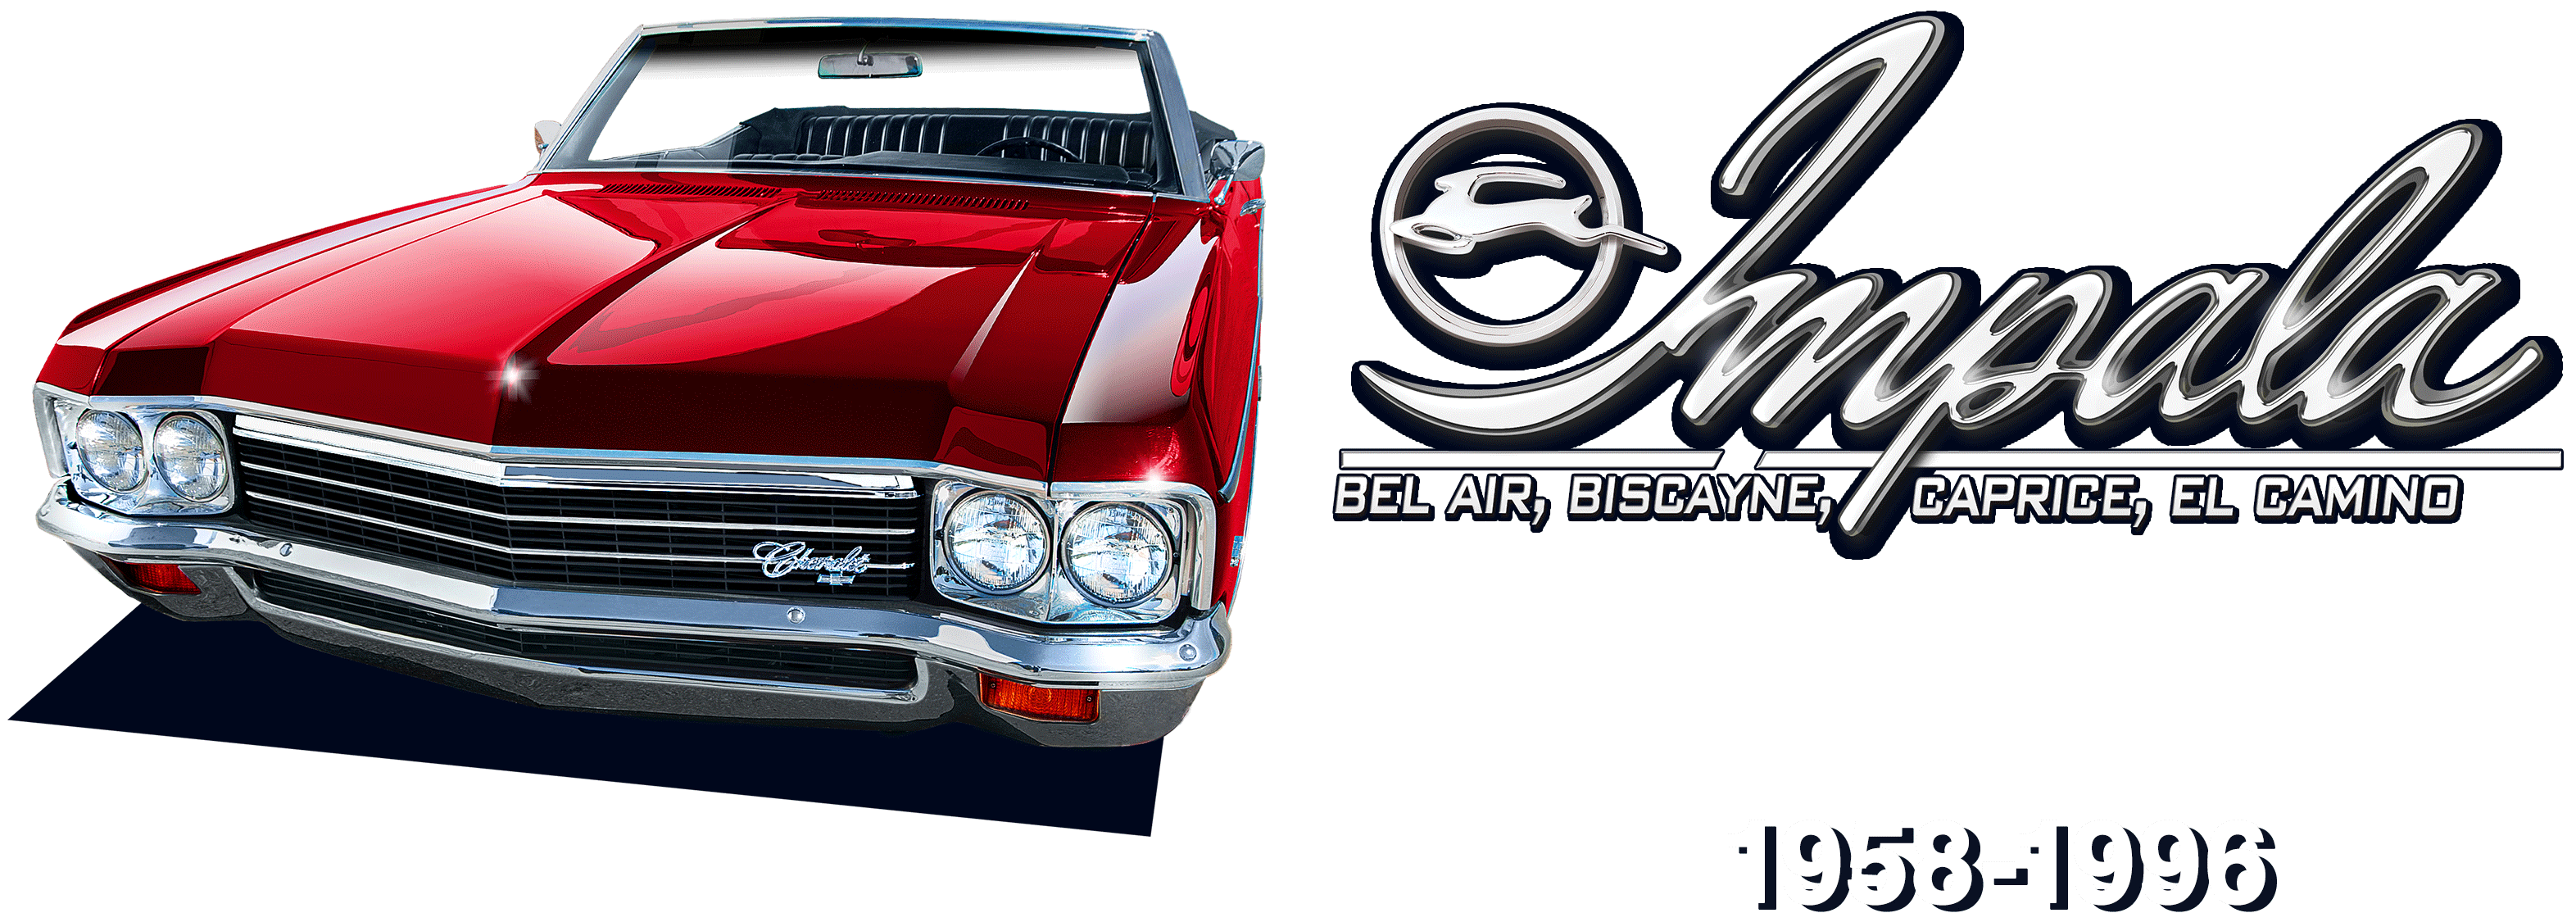 Impala Bel Air, Biscayne, Caprice, El Camino 1958-1996